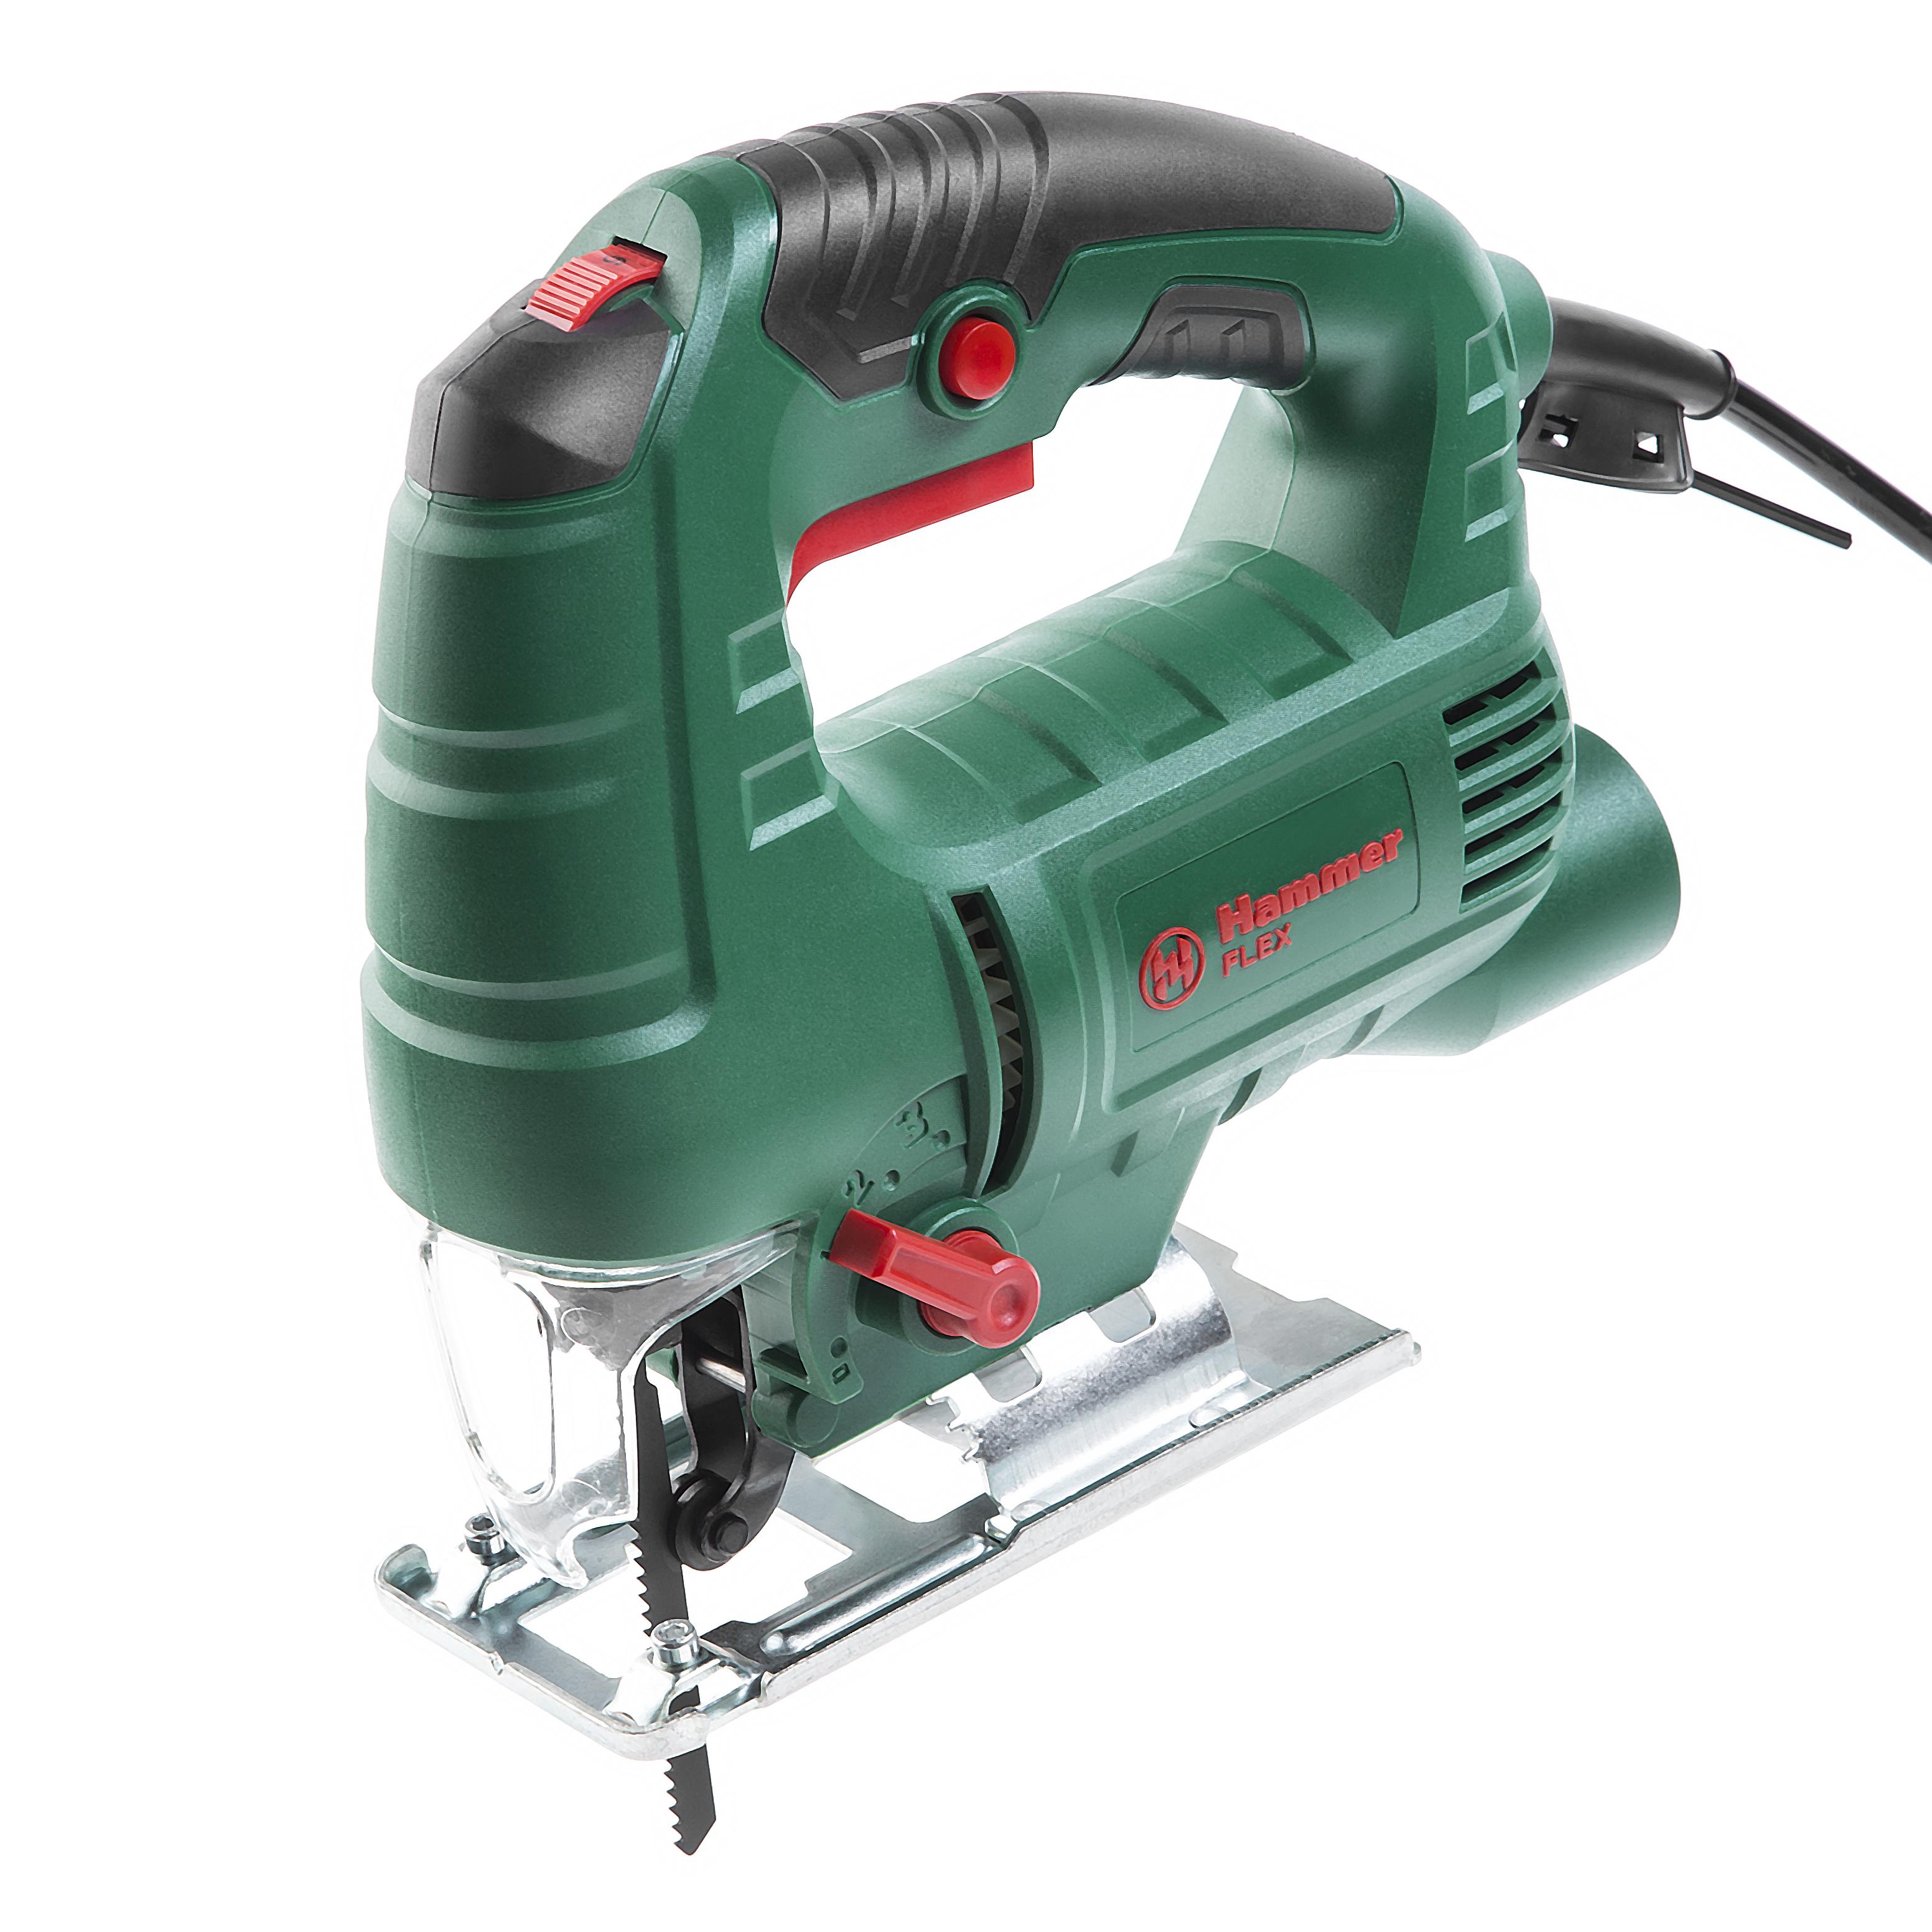 Лобзик Hammer Lzk650l лобзик электрический hammer flex lzk650l